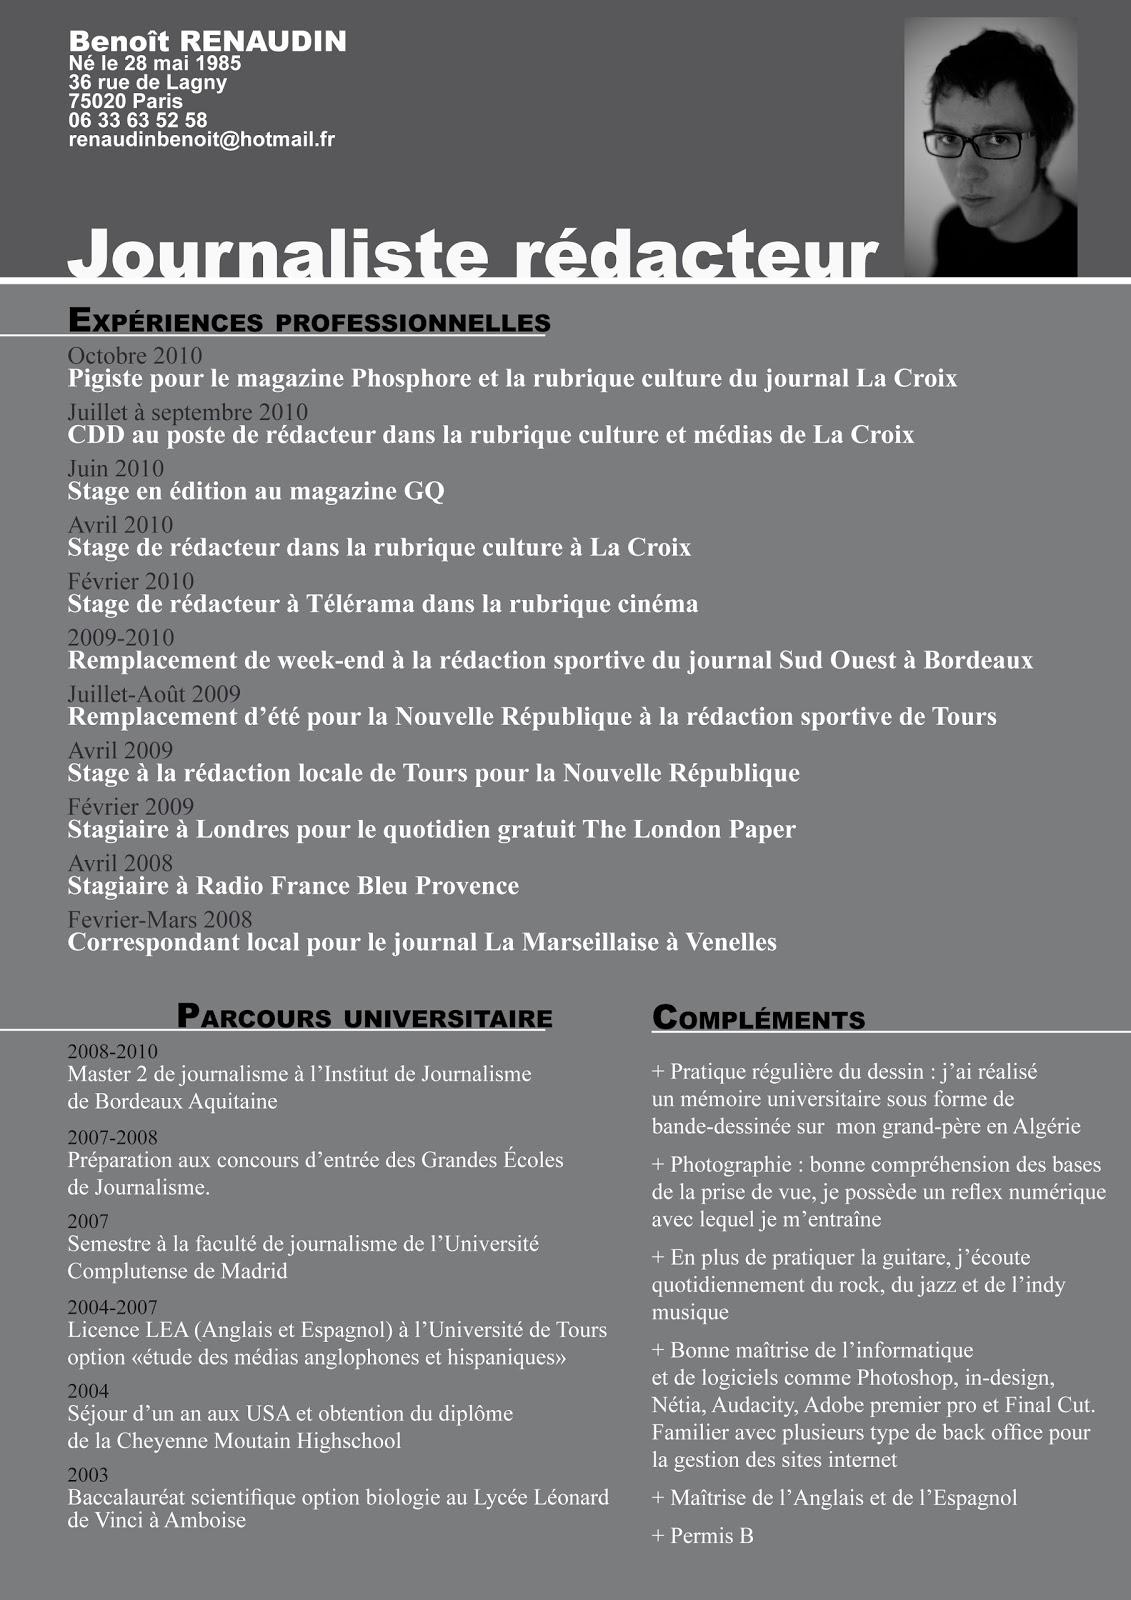 resume format  exemple de cv journaliste gratuit